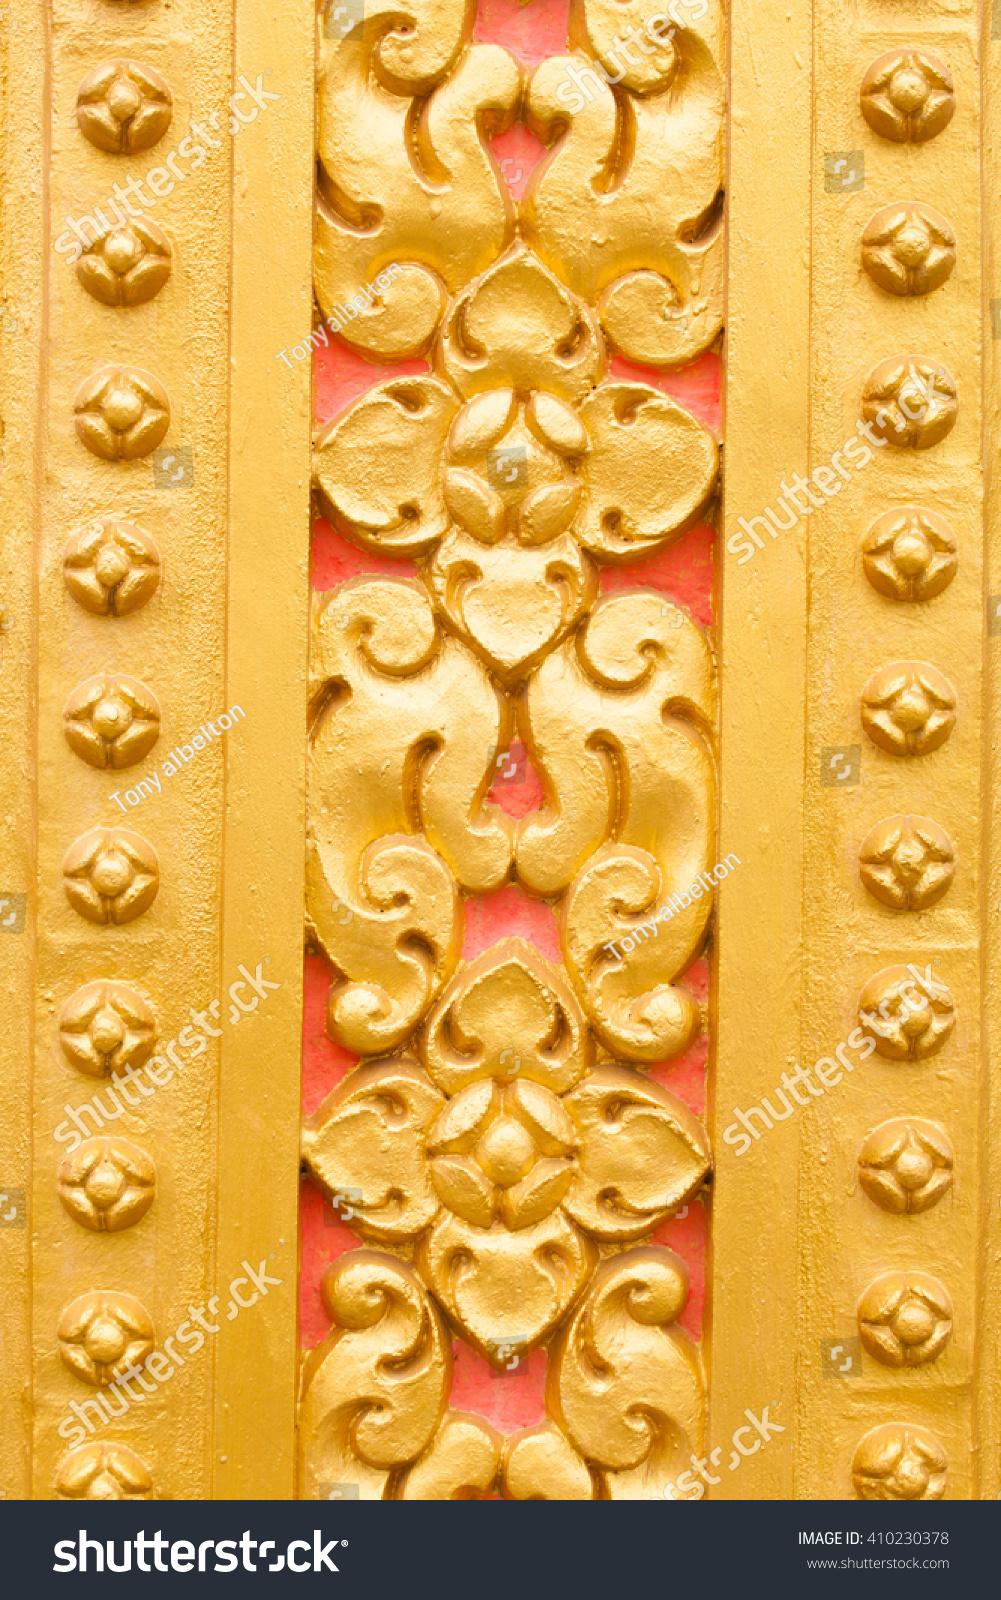 Floral Art On Wall Khmer Buddhist Stock Photo 410230378 - Shutterstock